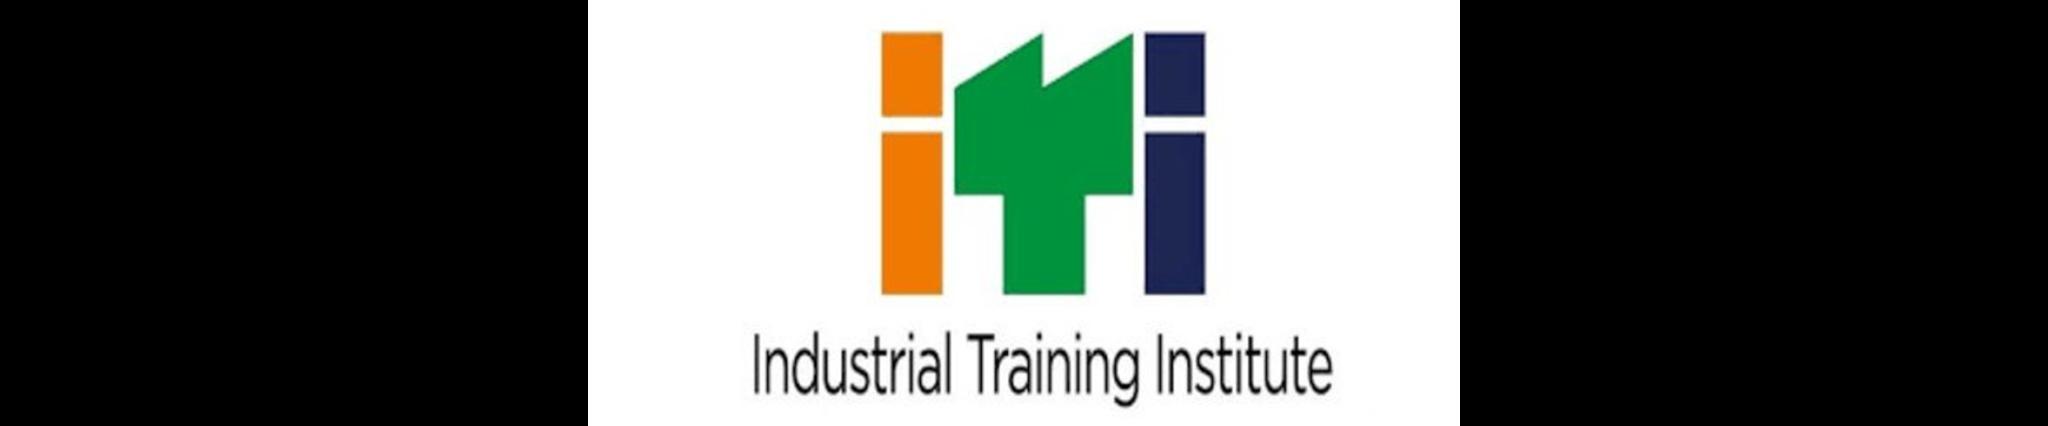 Chetan Prakashan - CAD CAM Training Institute in Chittorgarh HO, Chittorgarh